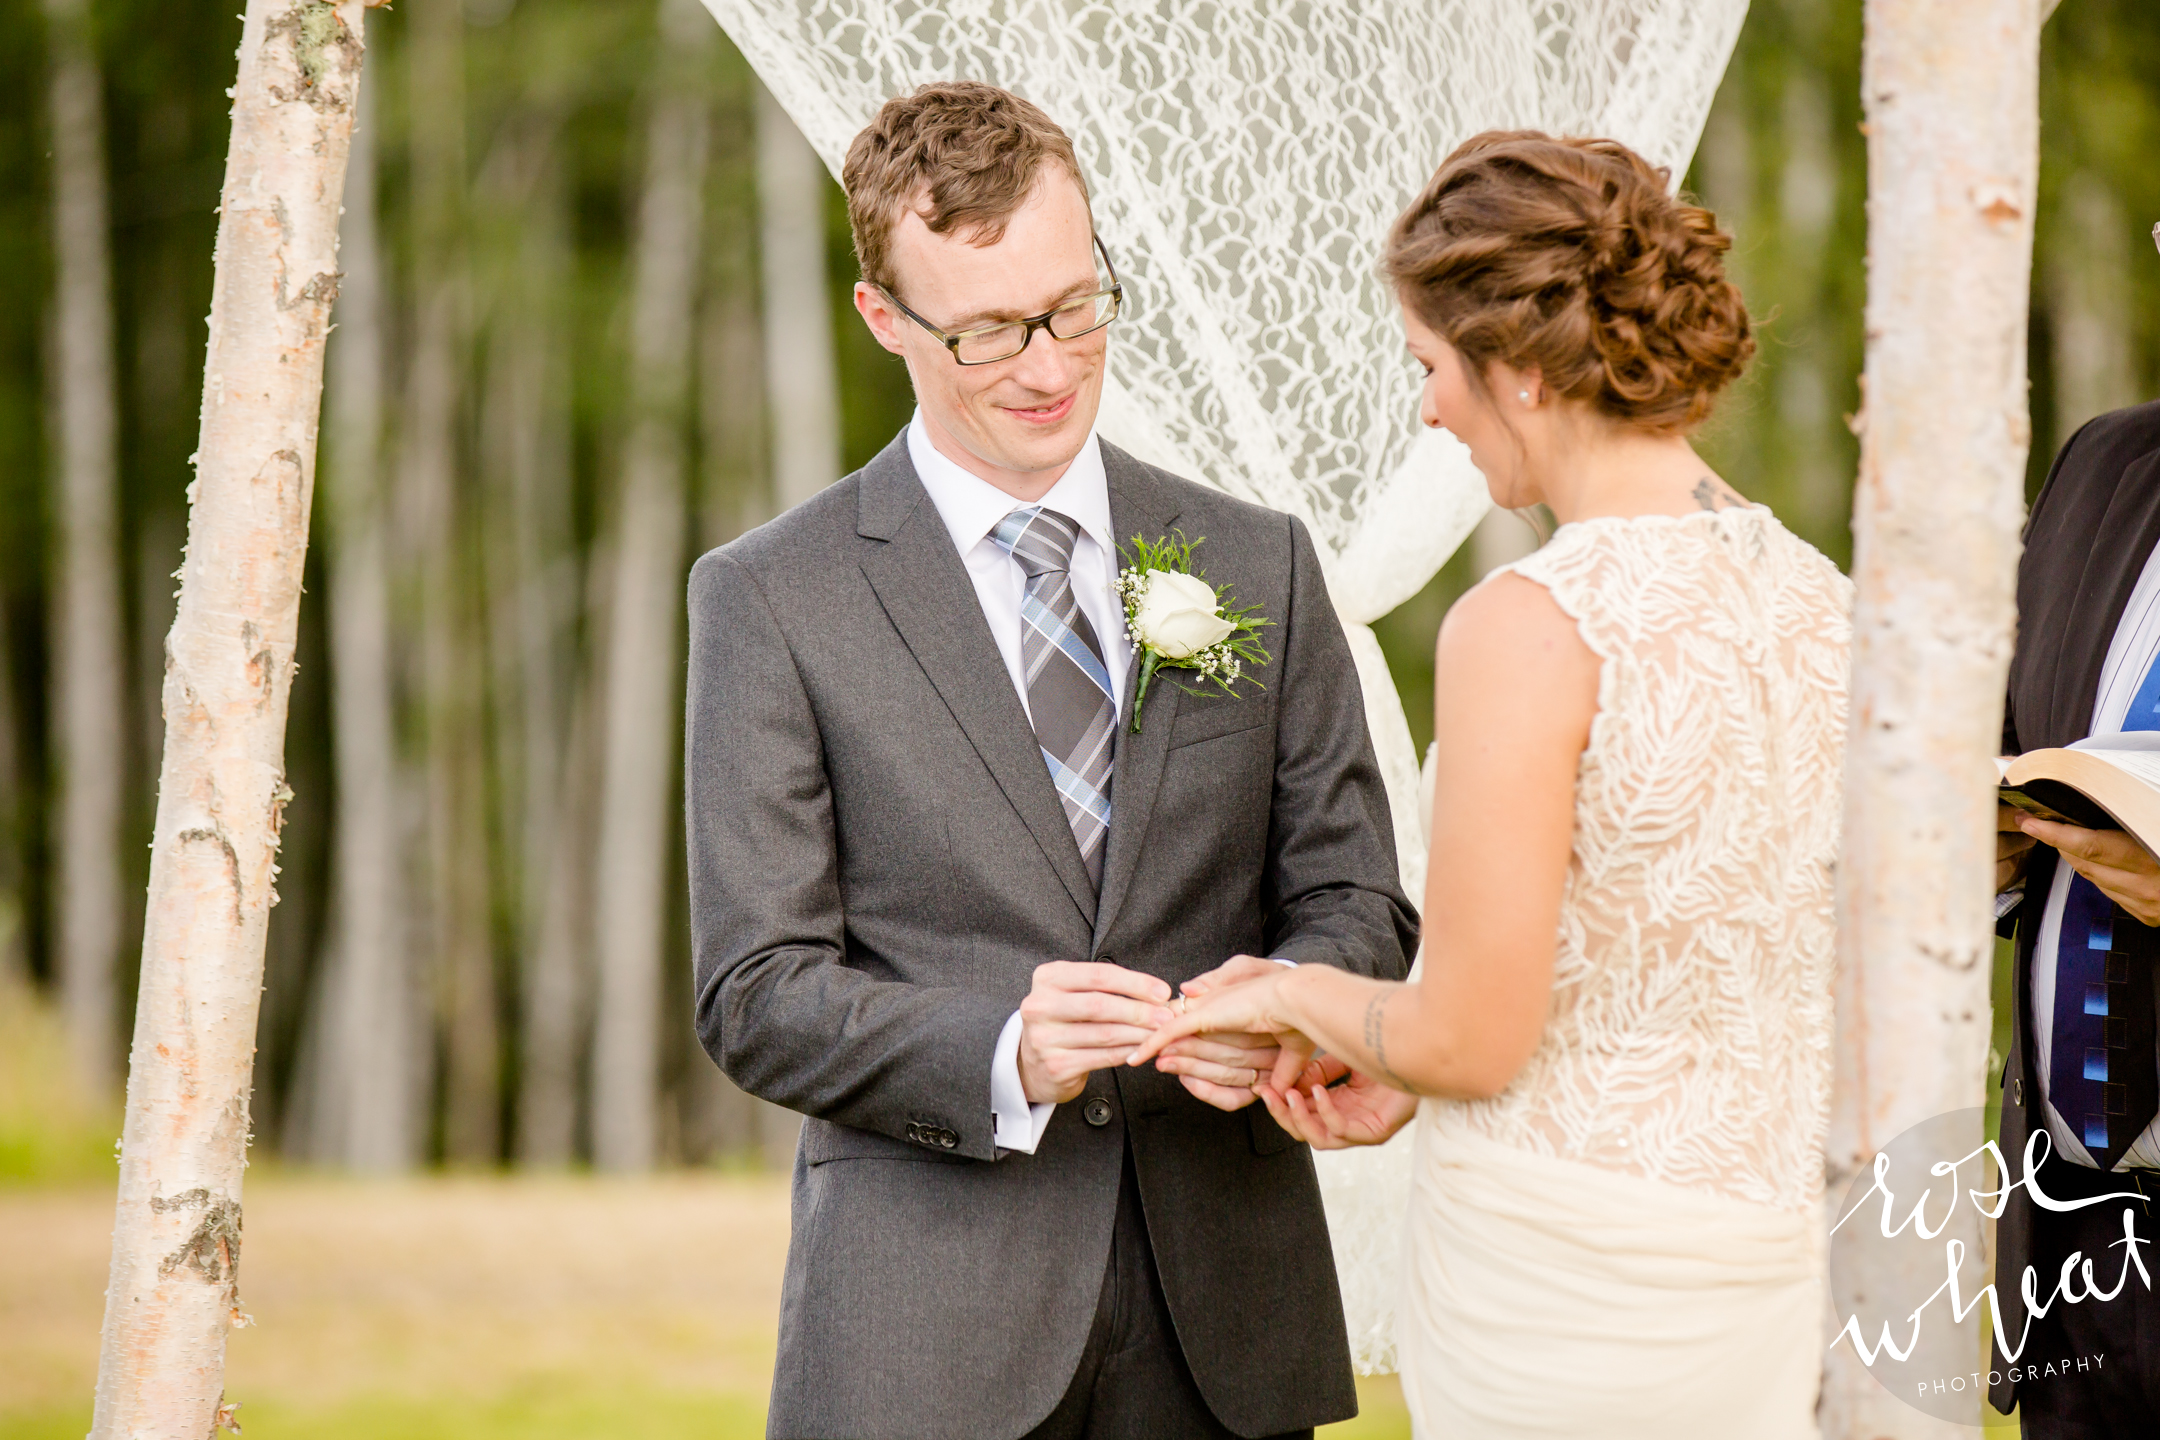 12. Birch_Hill_Fairbanks_Ak_Wedding_Rose_Wheat_Photogrpahy-1.jpg-14.jpg